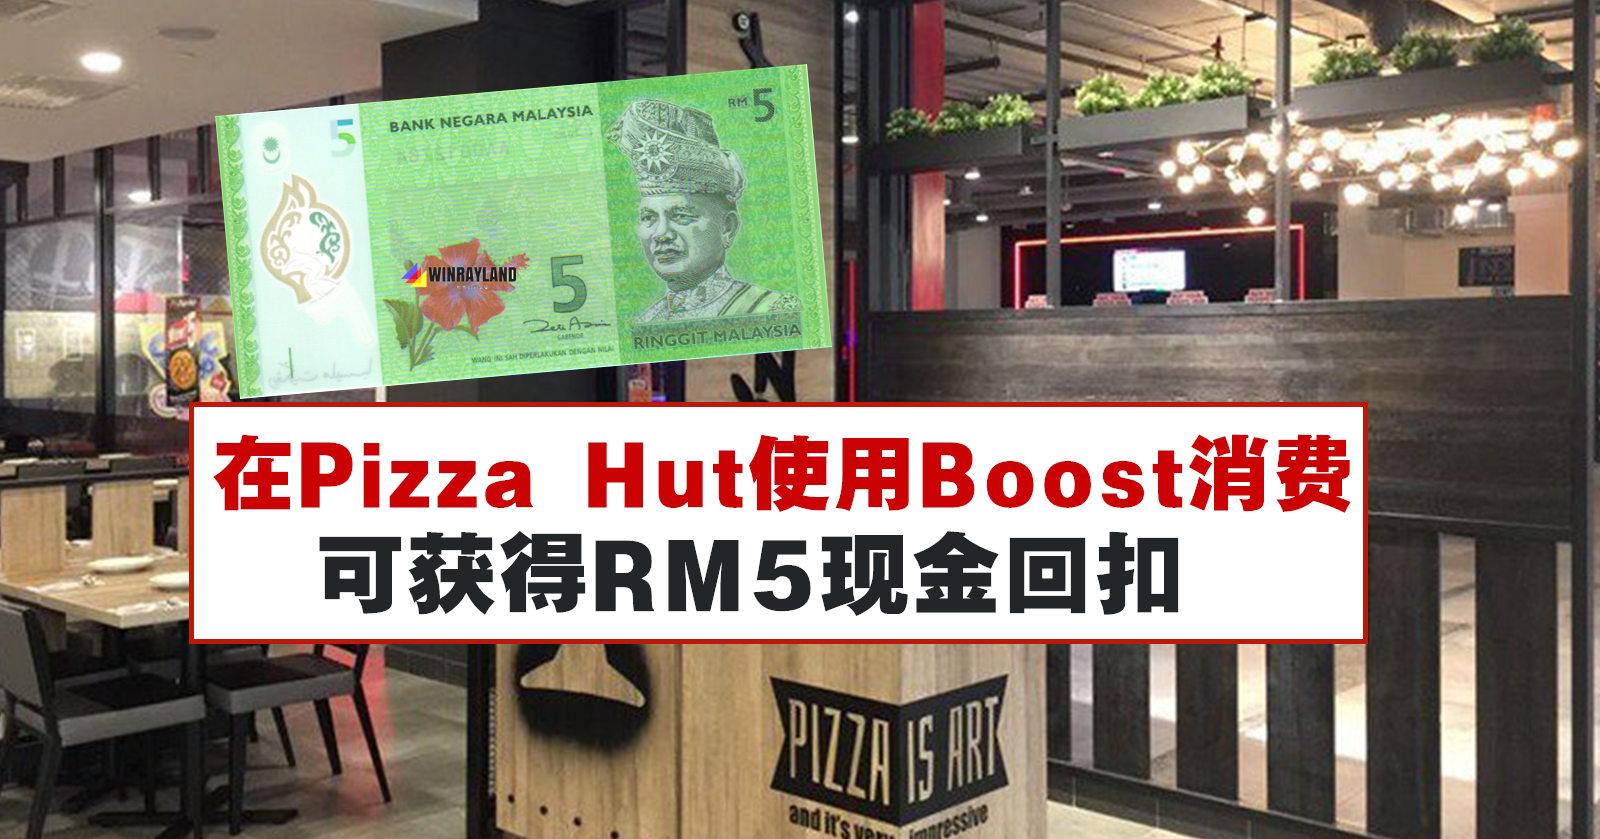 在Pizza Hut使用Boost消费可获得RM5现金回扣